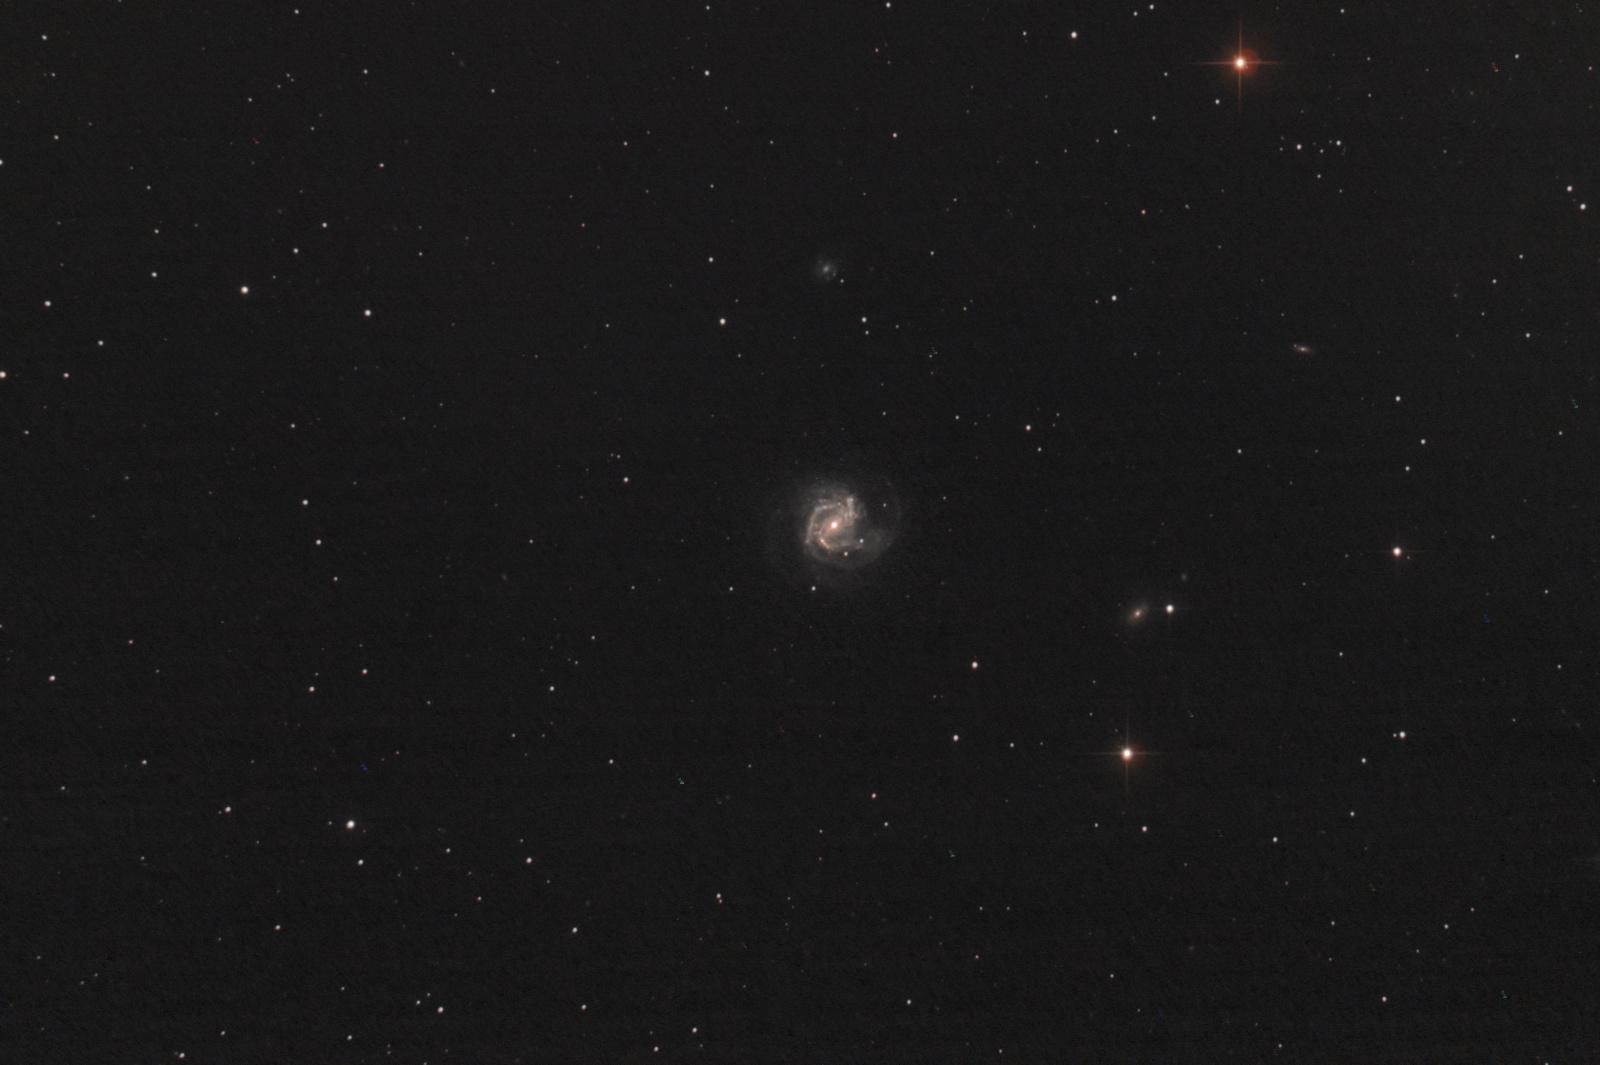 M61_supernowa-RGB.thumb.jpg.eeec73226b3de84ec1dc1799cd7de085.jpg